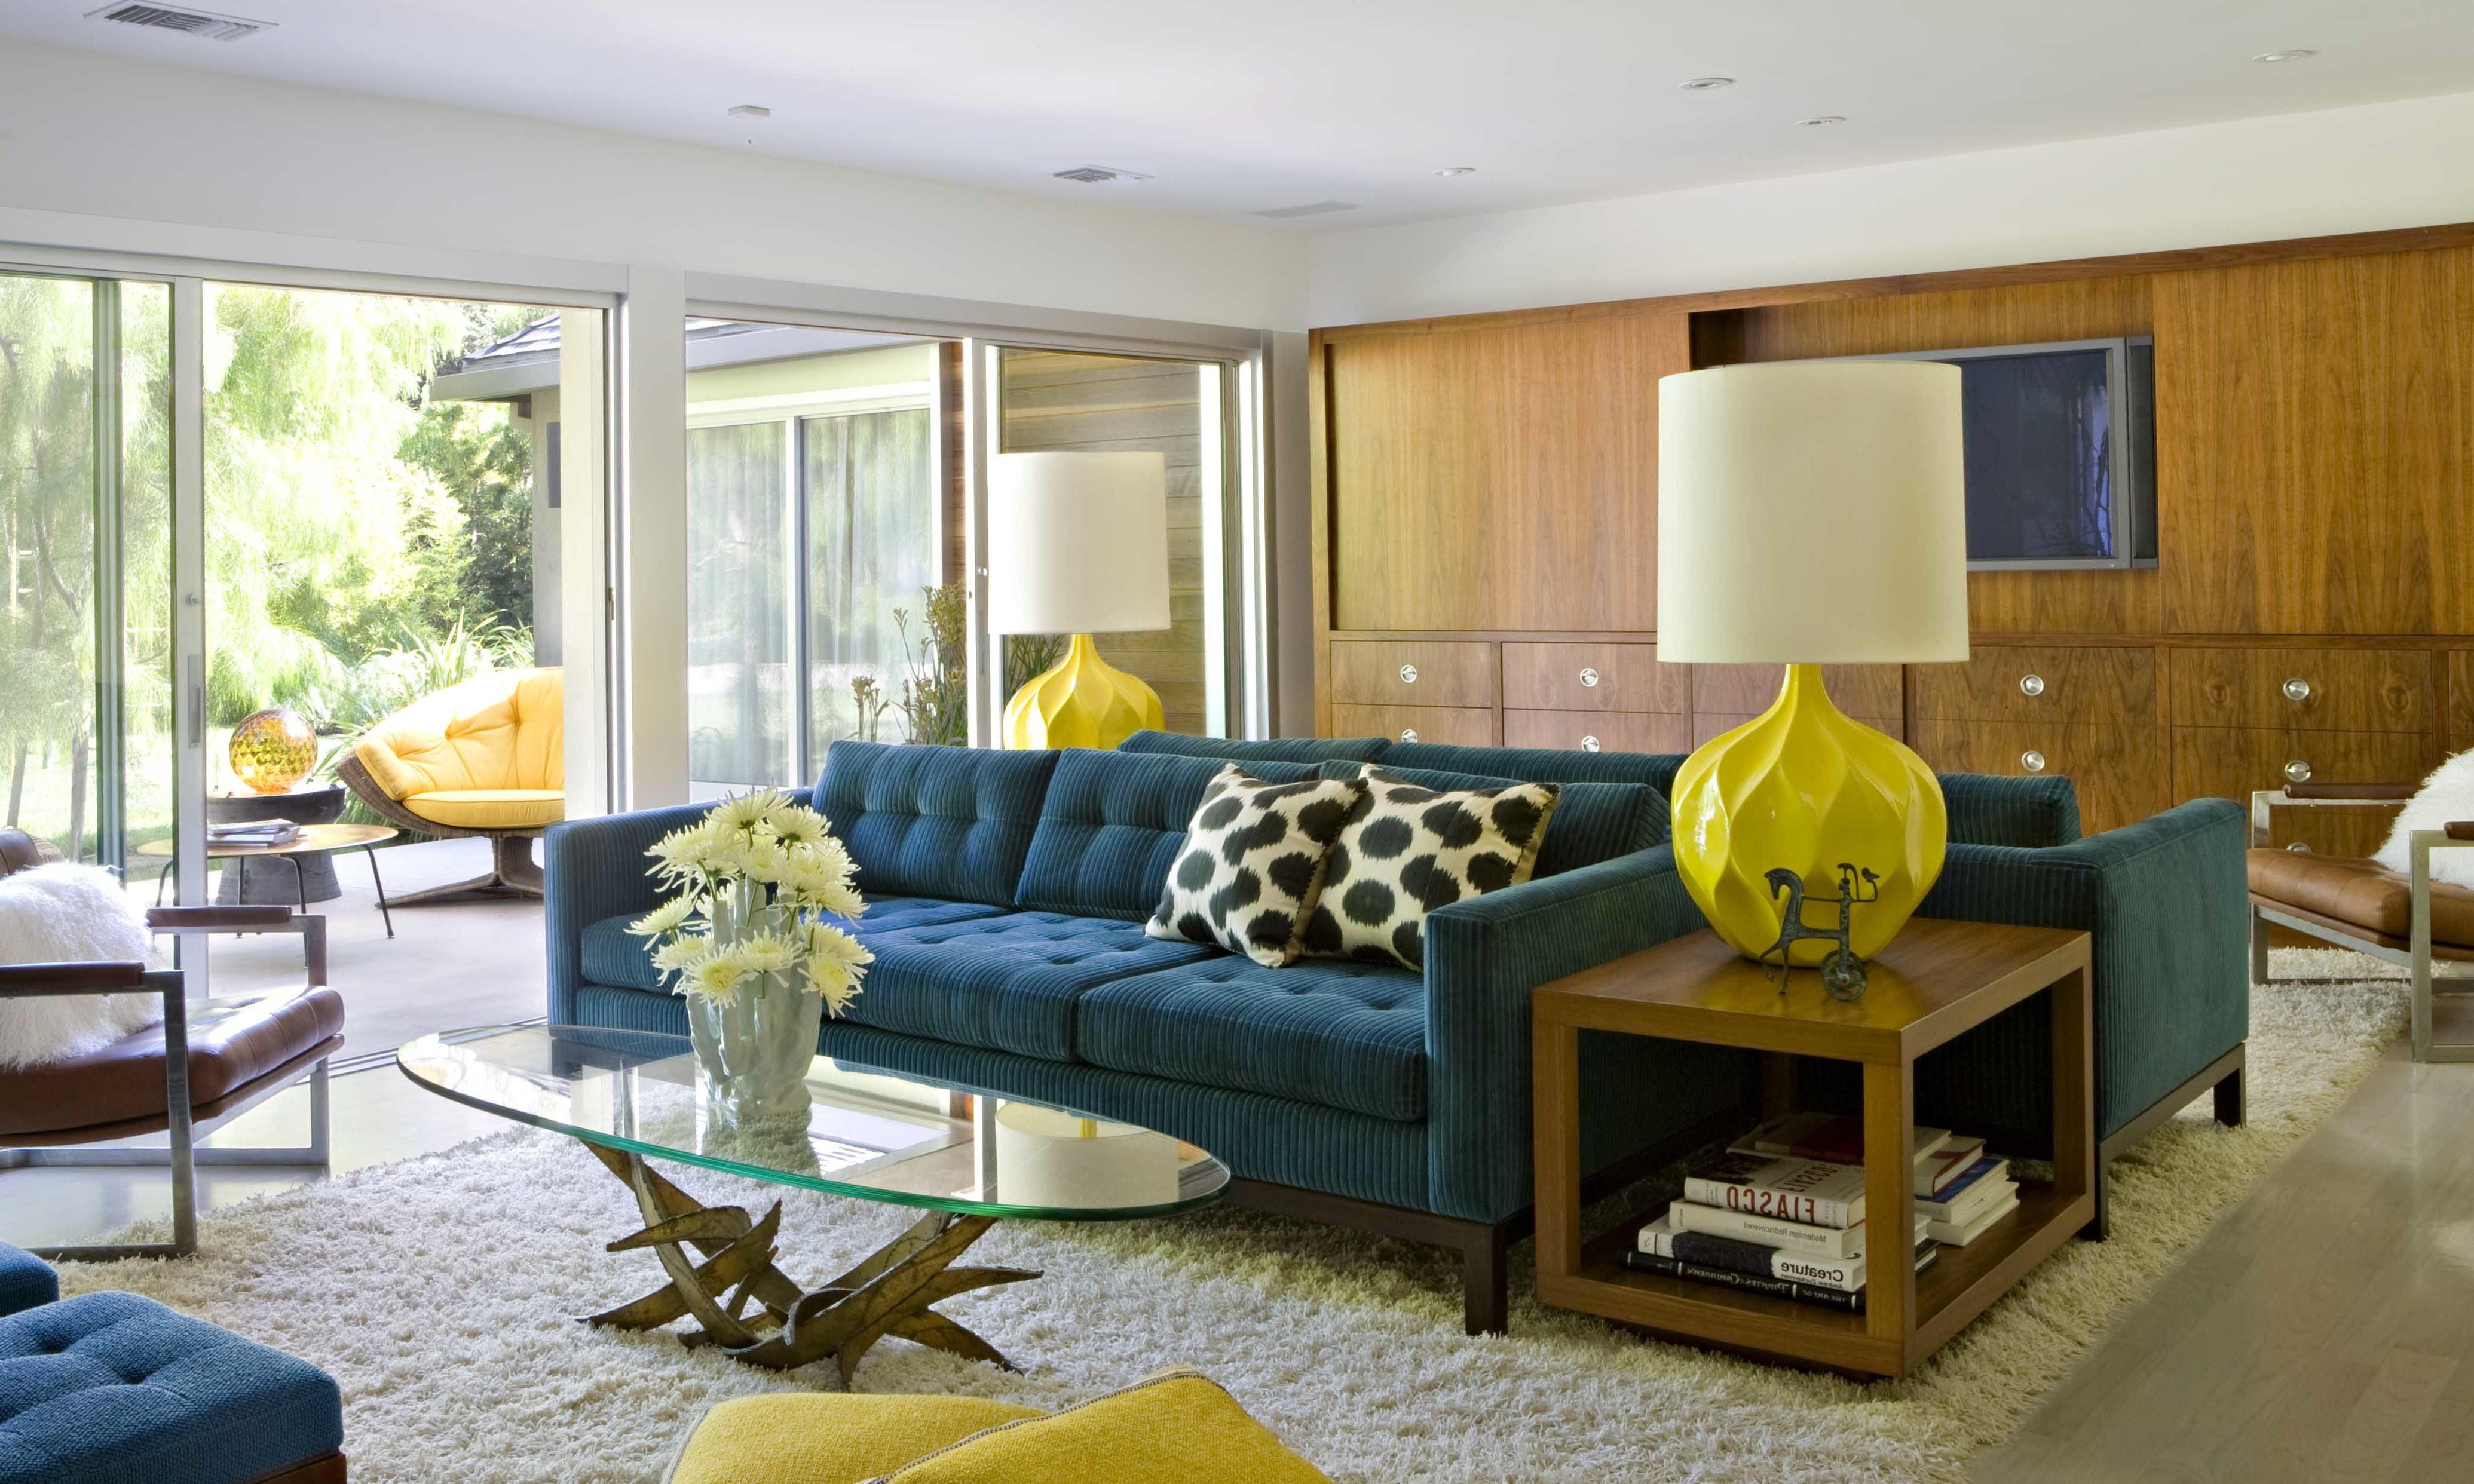 Best Table Lamps For Living Room Lighting Ideas